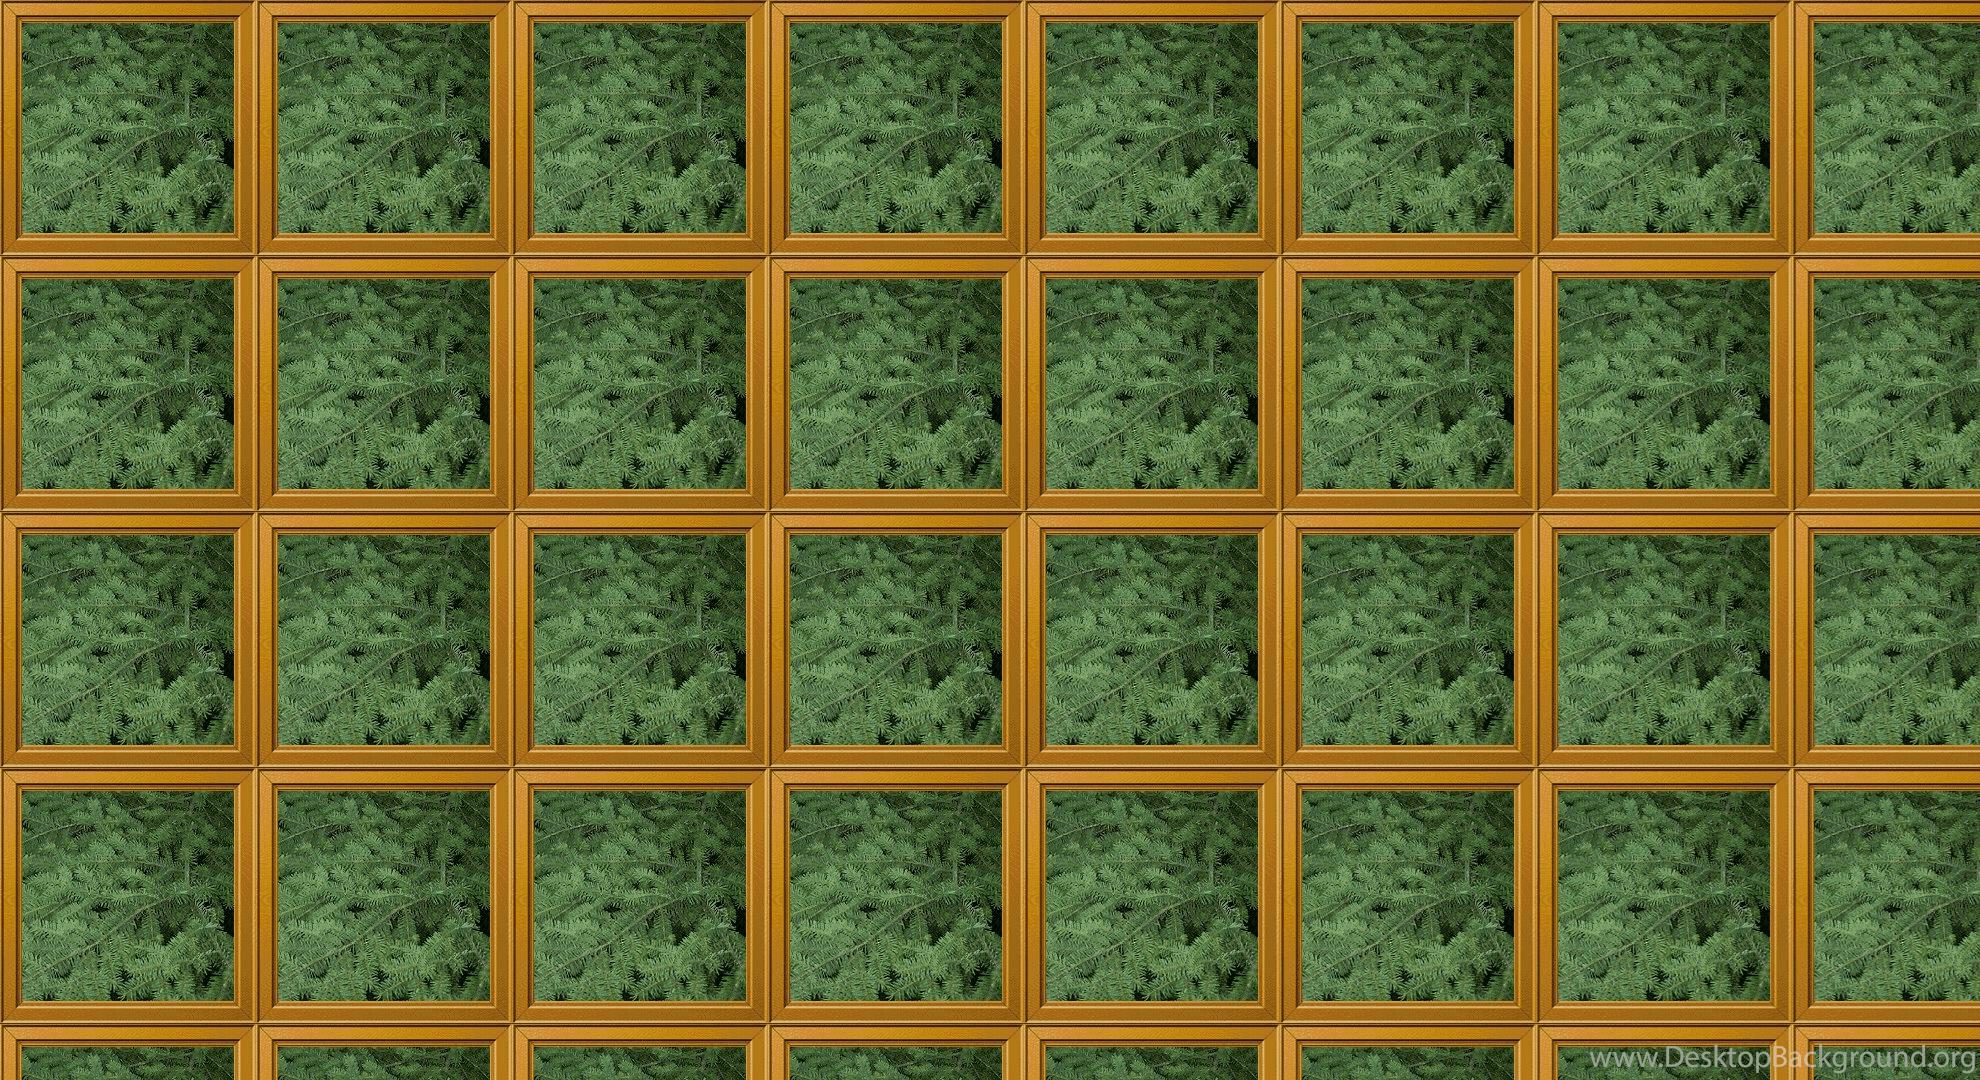 Windows 95 Backgrounds - Wallpaper Cave